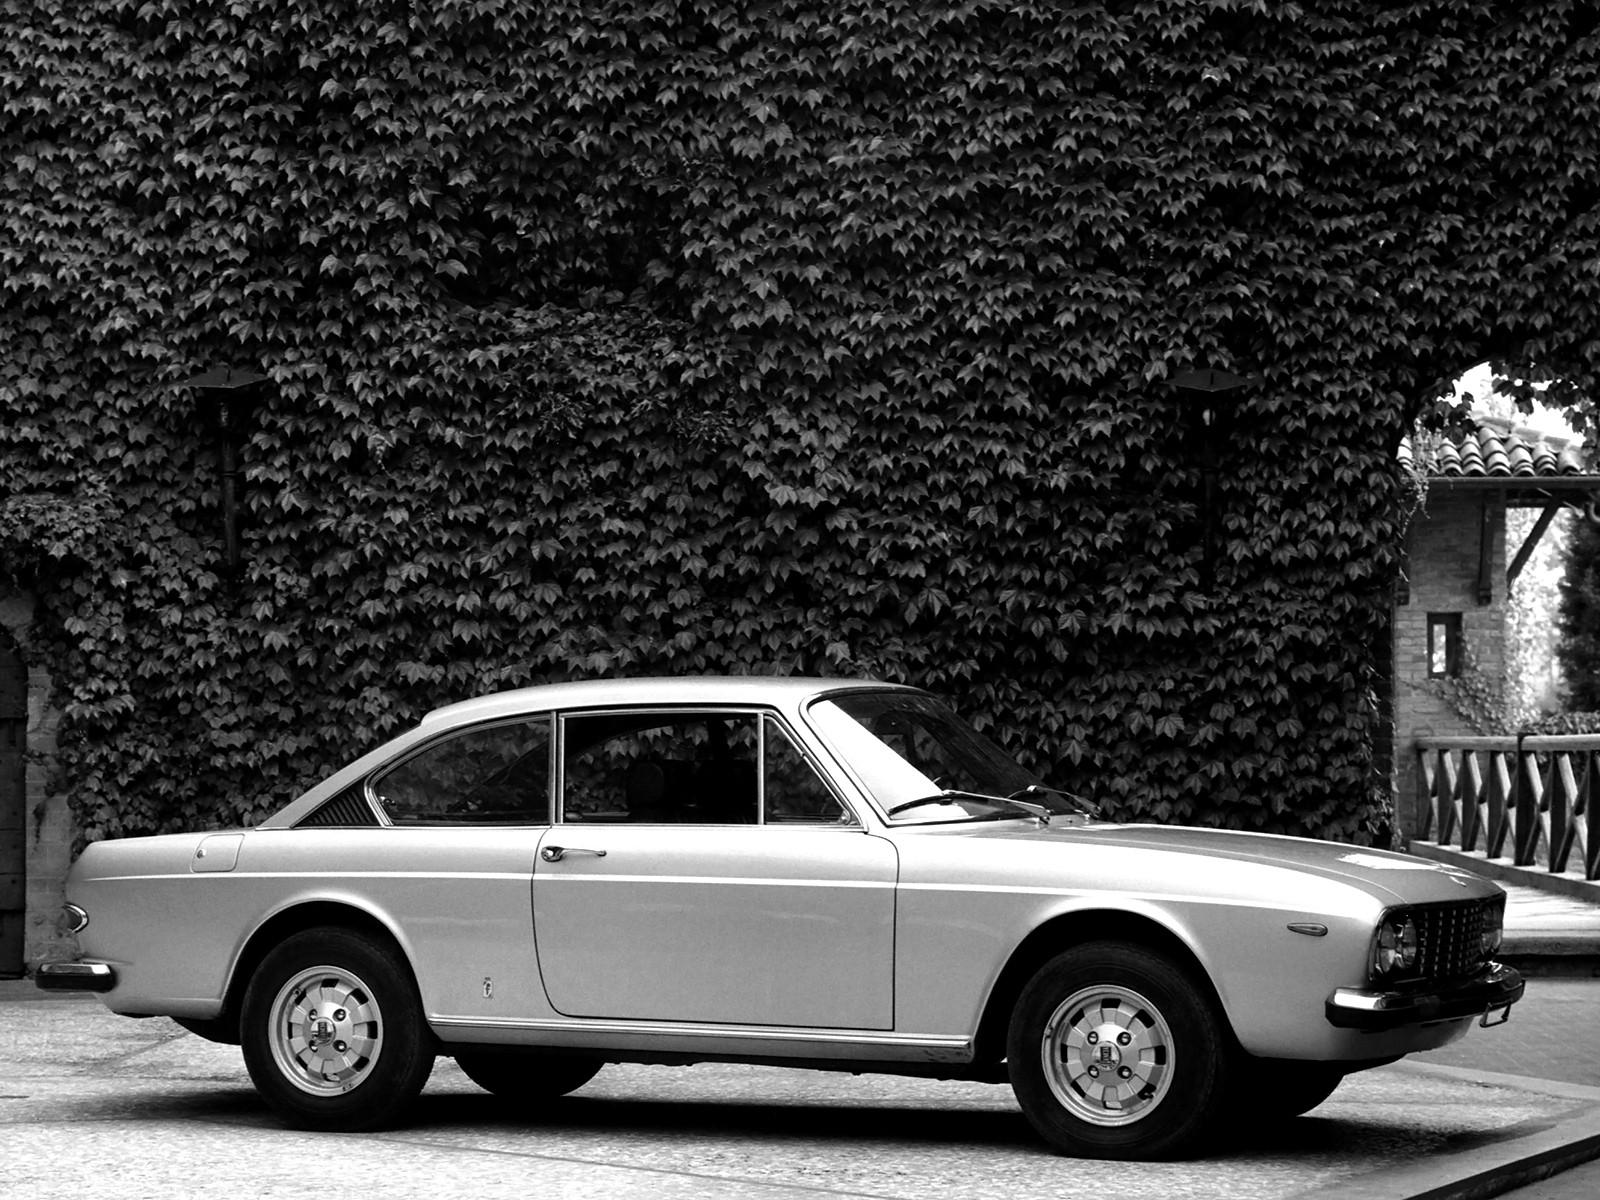 https://s1.cdn.autoevolution.com/images/gallery/LANCIA-2000-Coupe-3372_11.jpg